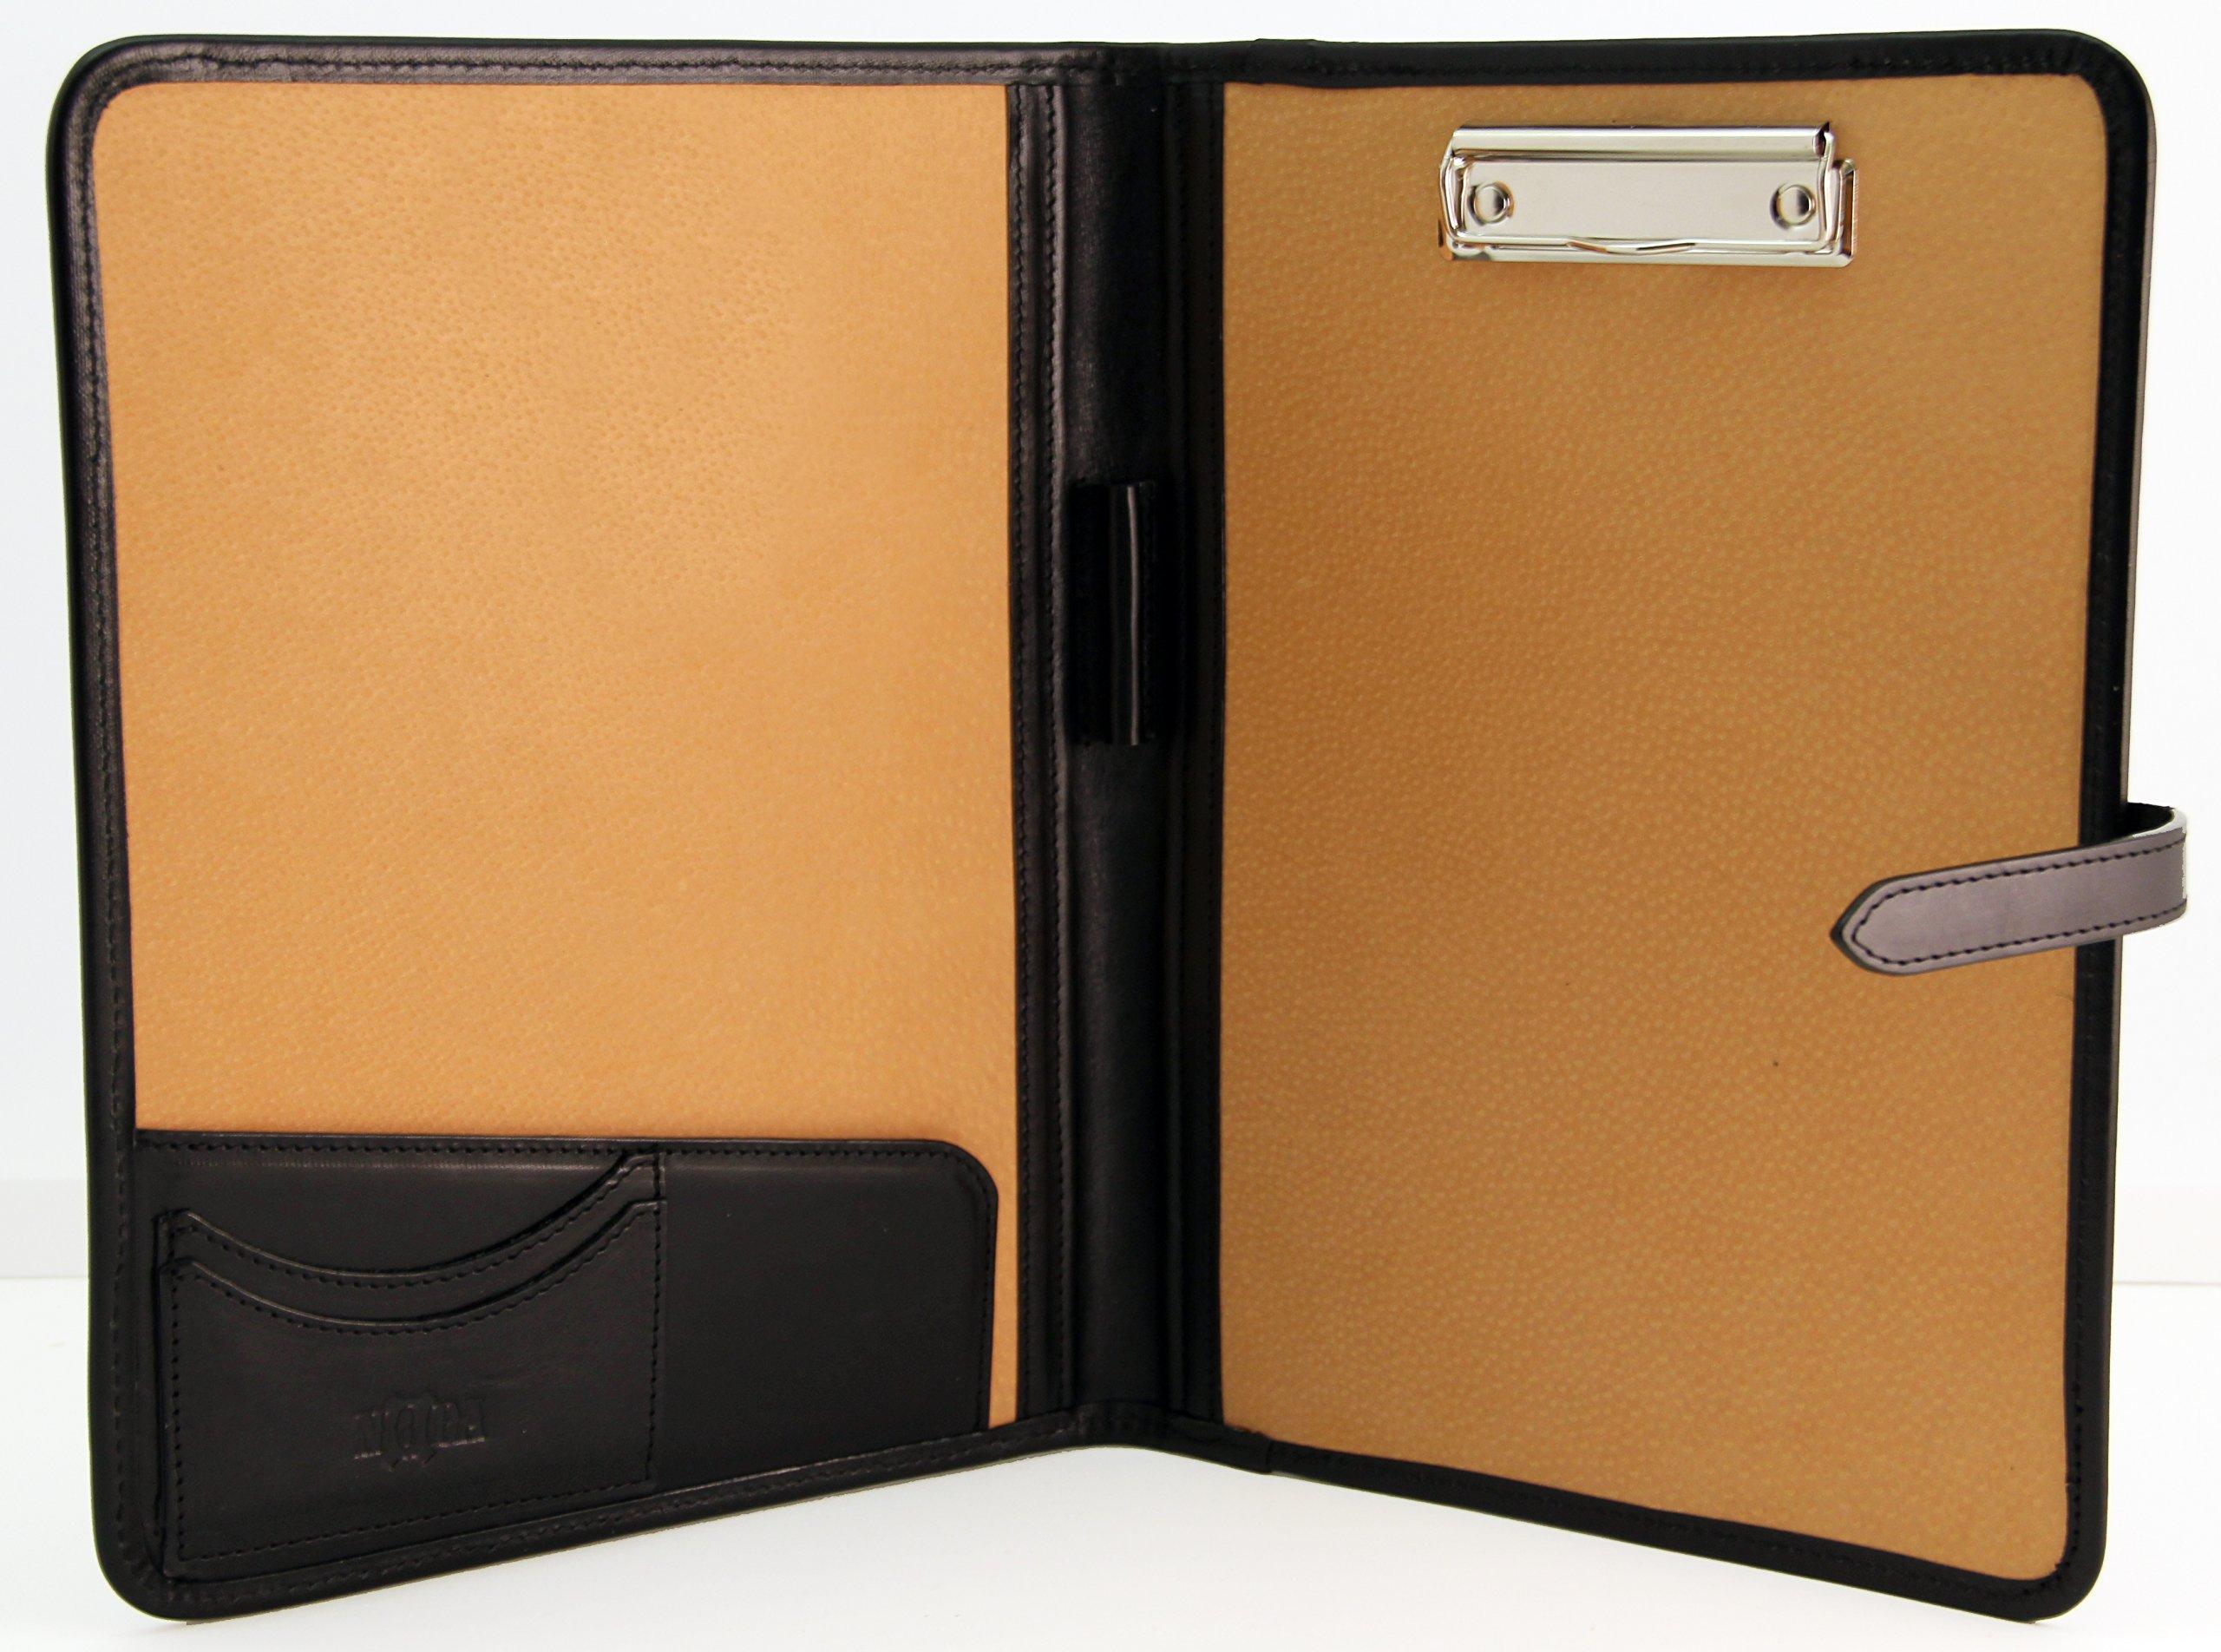 Noda Italian Genuine Vegetable Tanned Leather Business Presentation Meeting Conference A4 Folder Clipboard Writing Pad Organiser (Black)